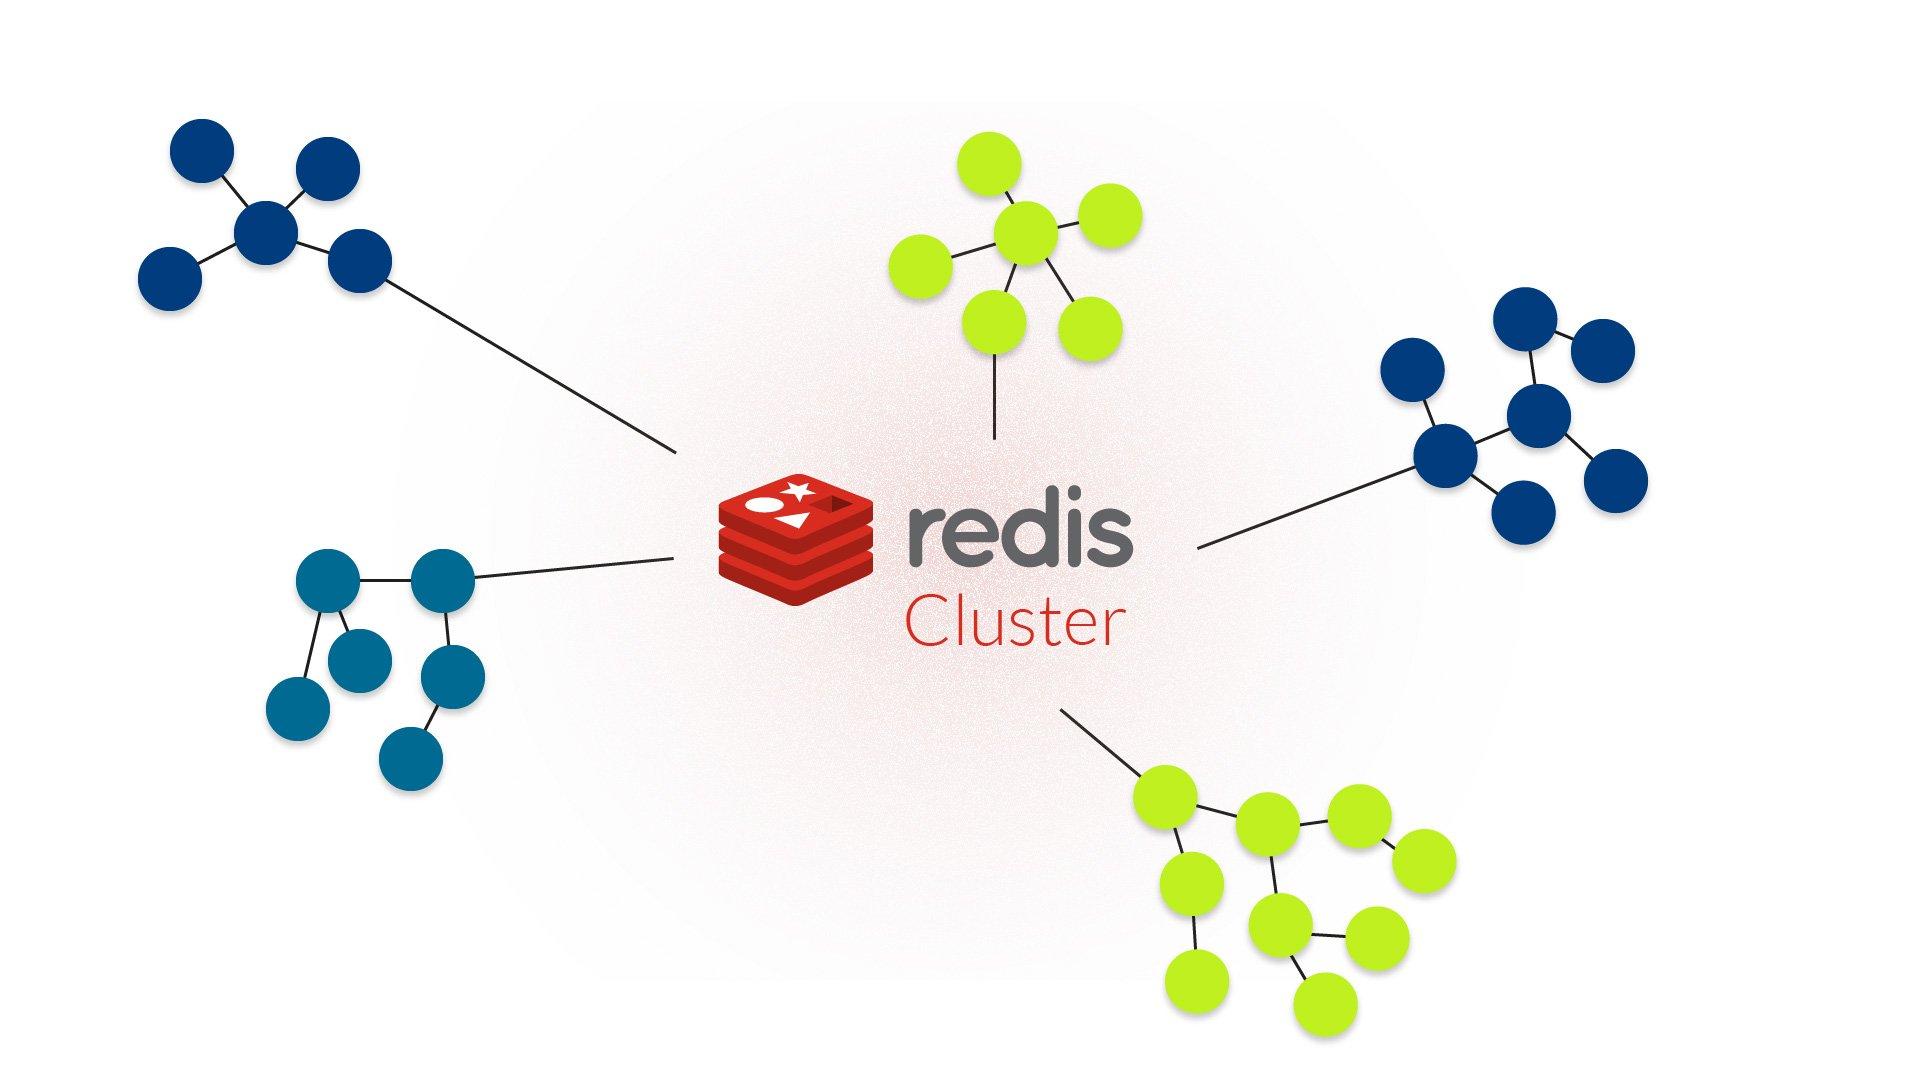 Redis Cluster Illustration